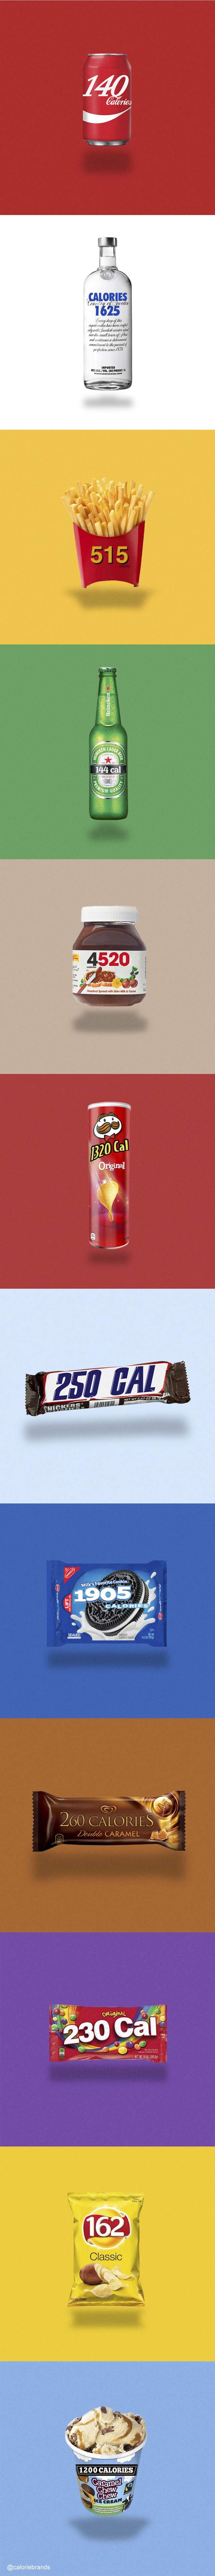 produtos-calorias-logo